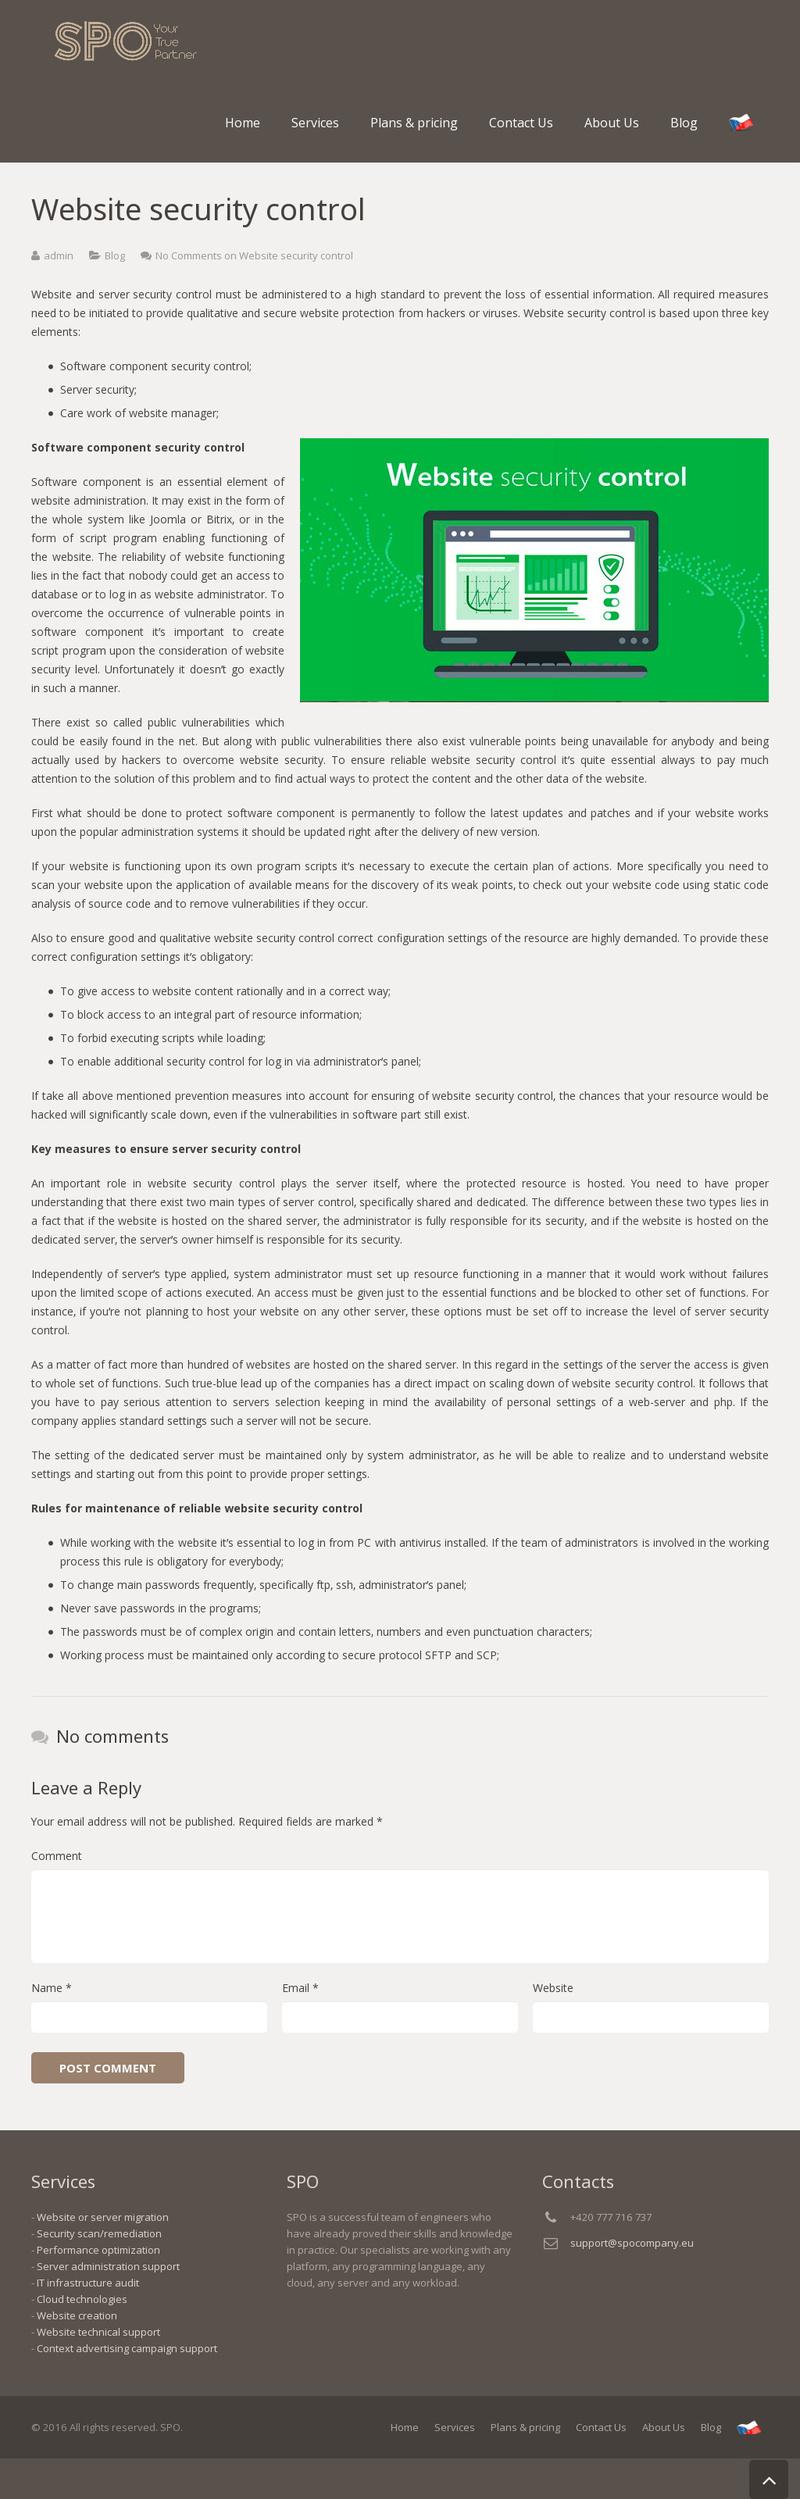 Website security control – work in freelancer's portfolio